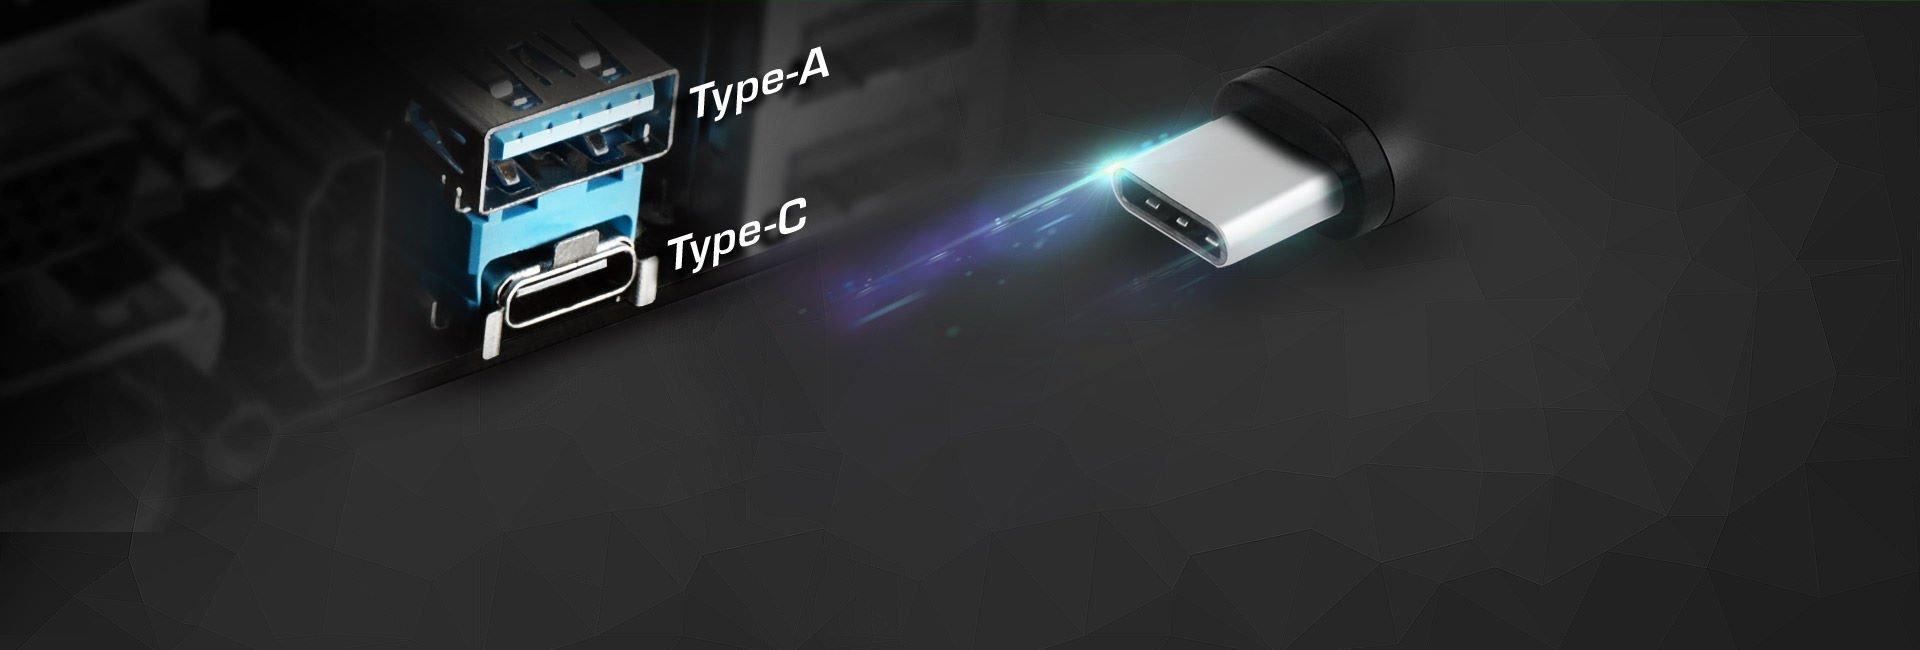 USBTypeC.jpg